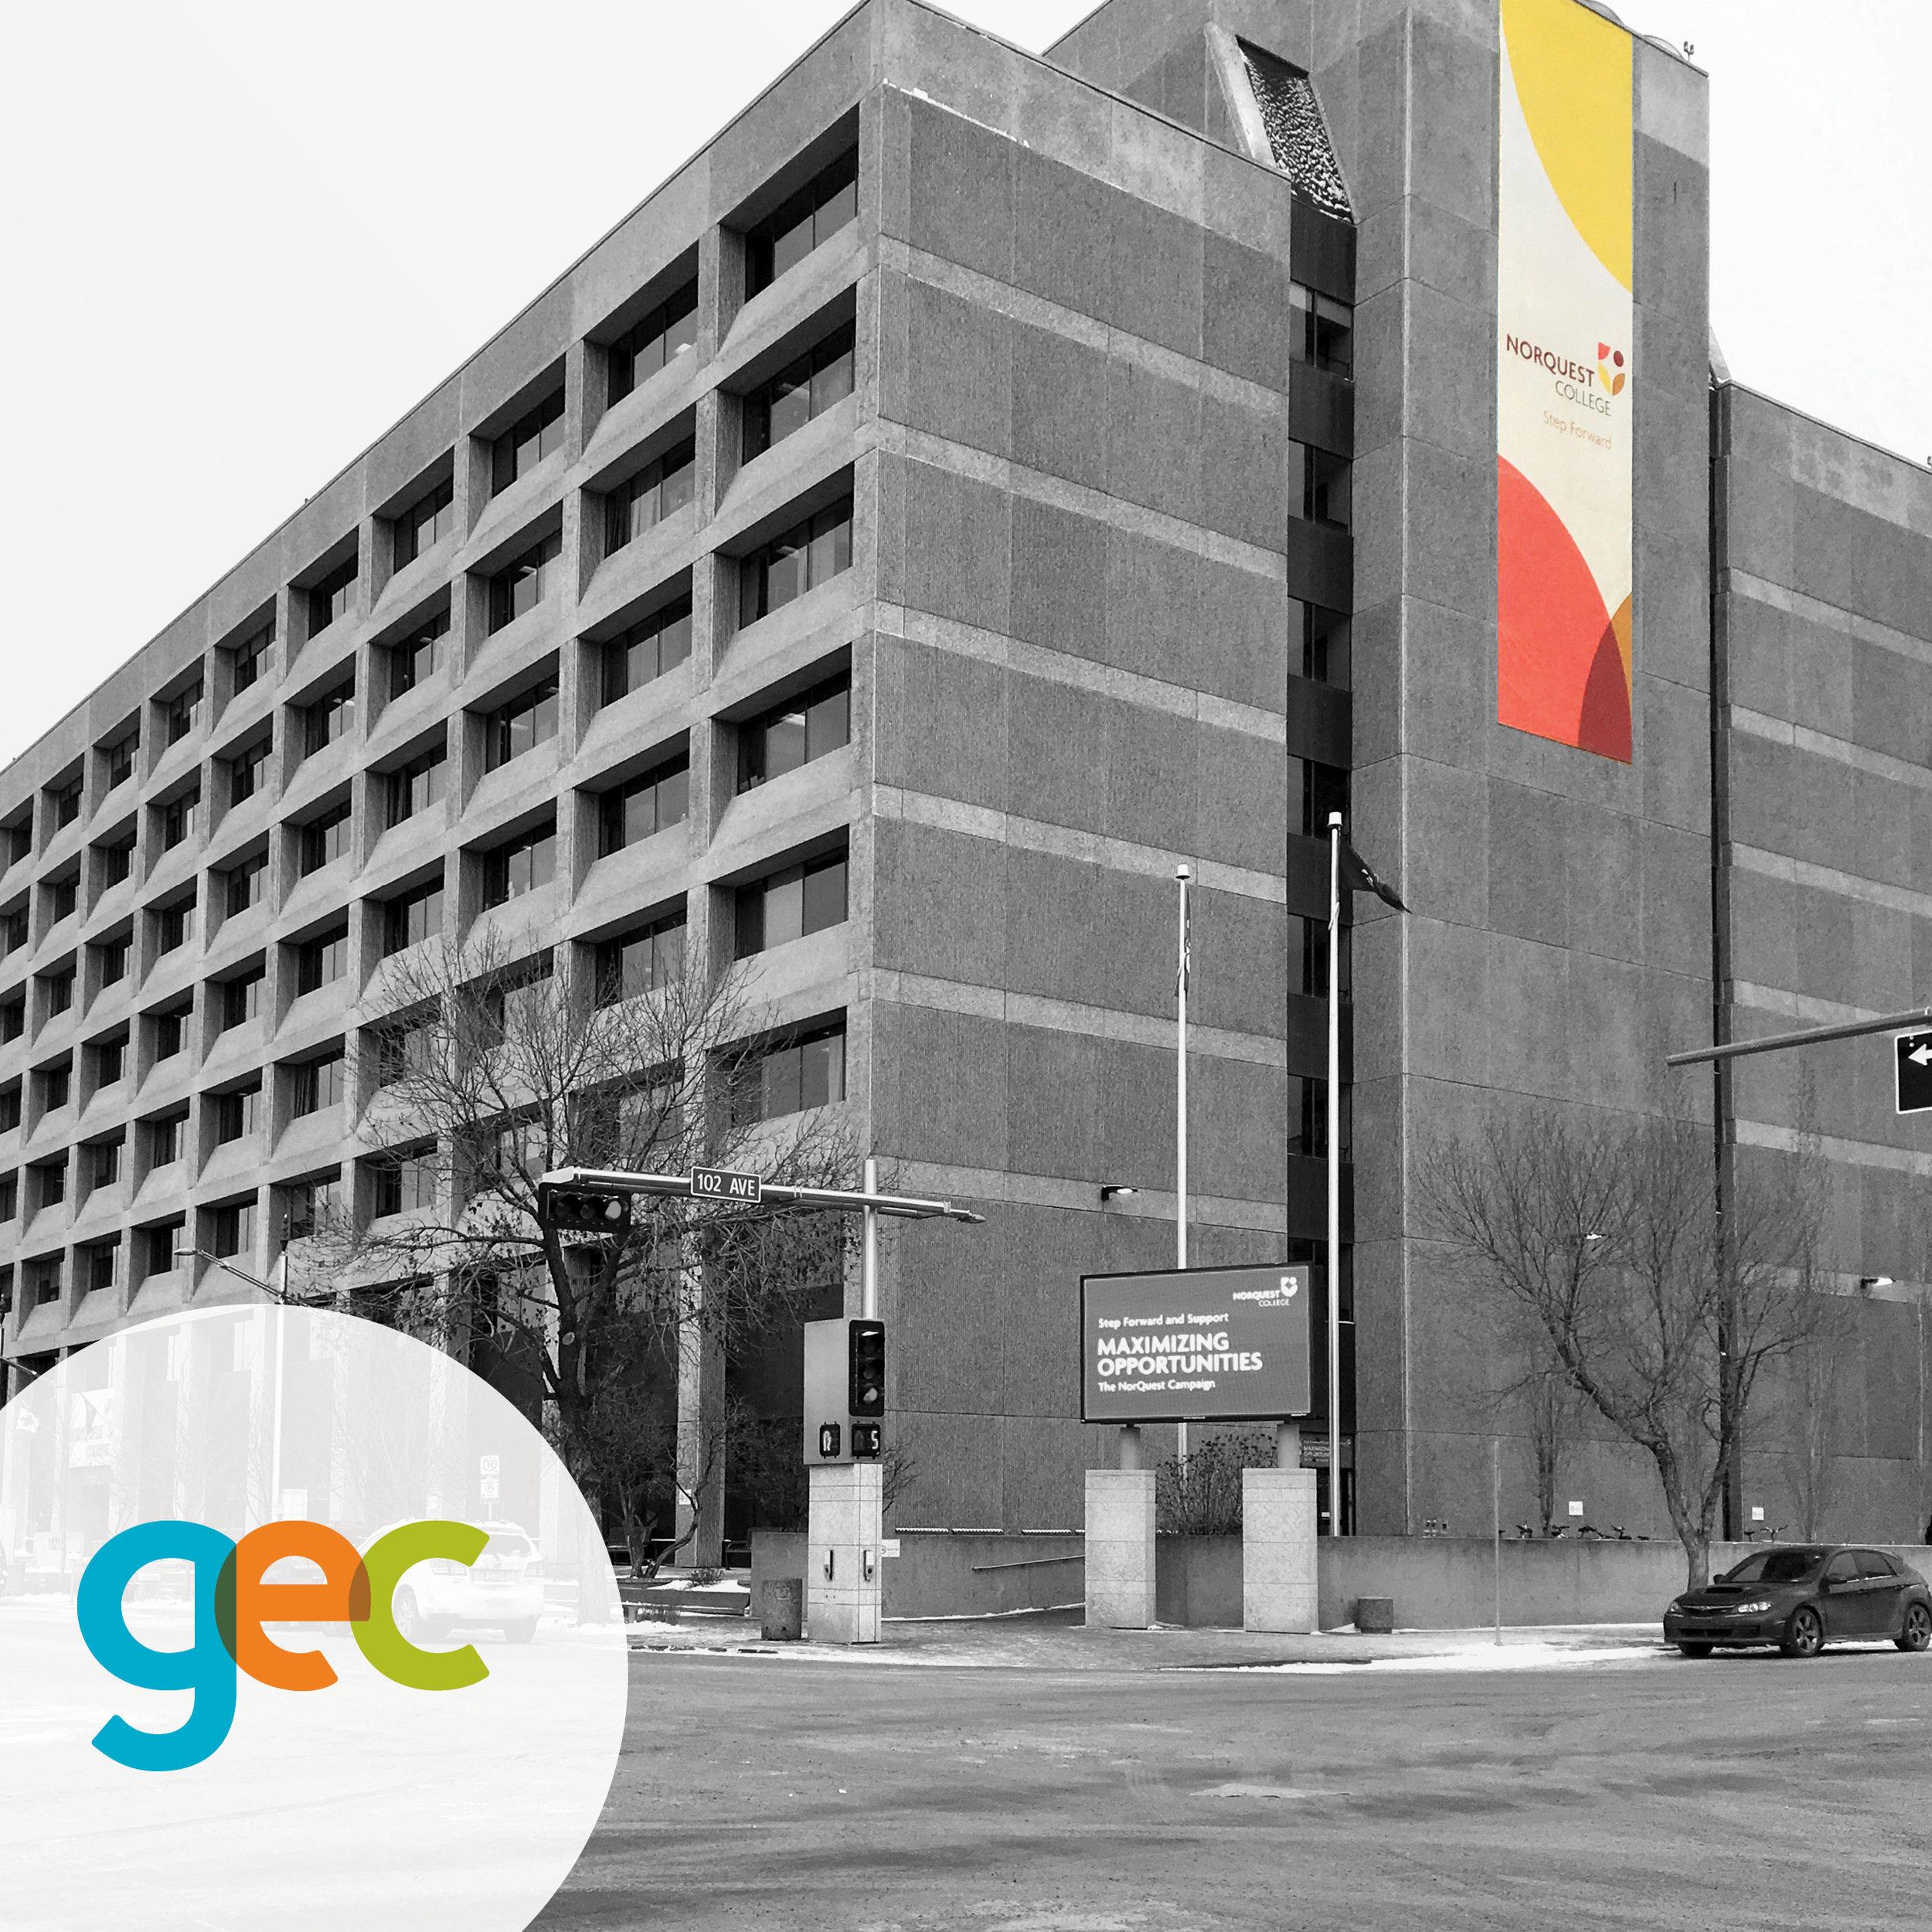 Blog — GEC Architecture